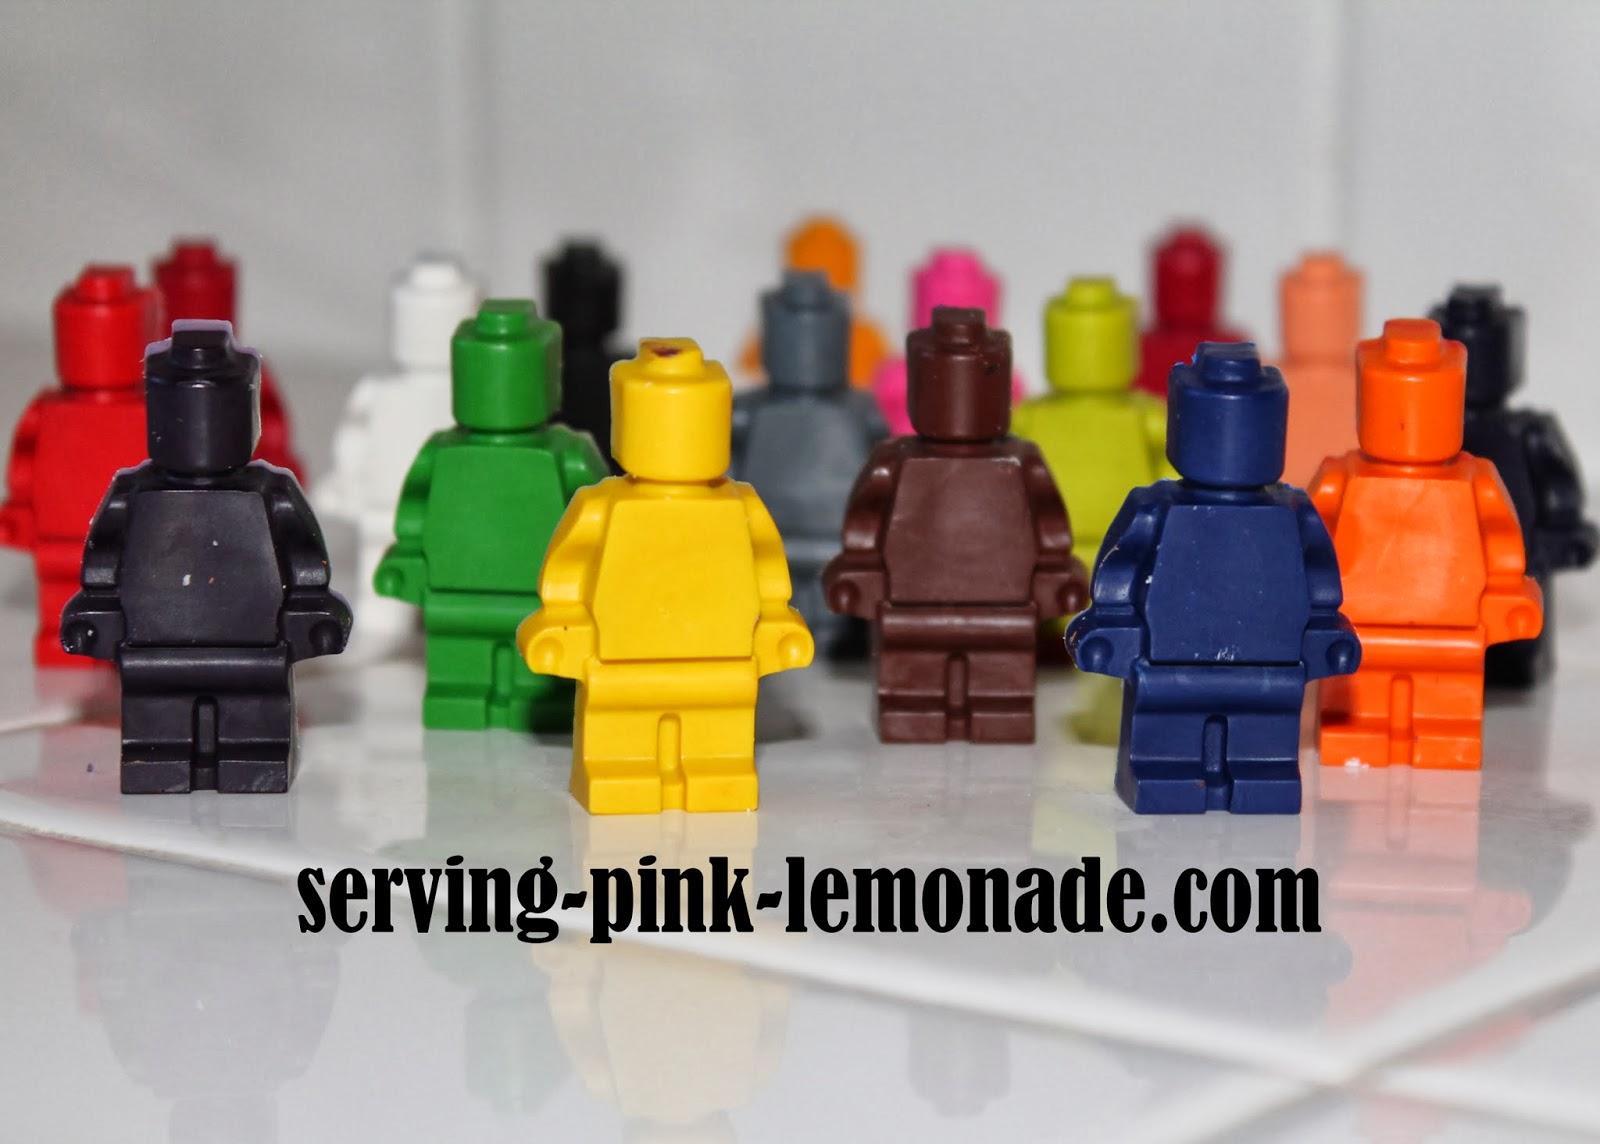 http://3.bp.blogspot.com/-bg7r7RTClCk/VImjn_E2DTI/AAAAAAAAR1g/O2J76iyb_xM/s1600/Lego.JPG